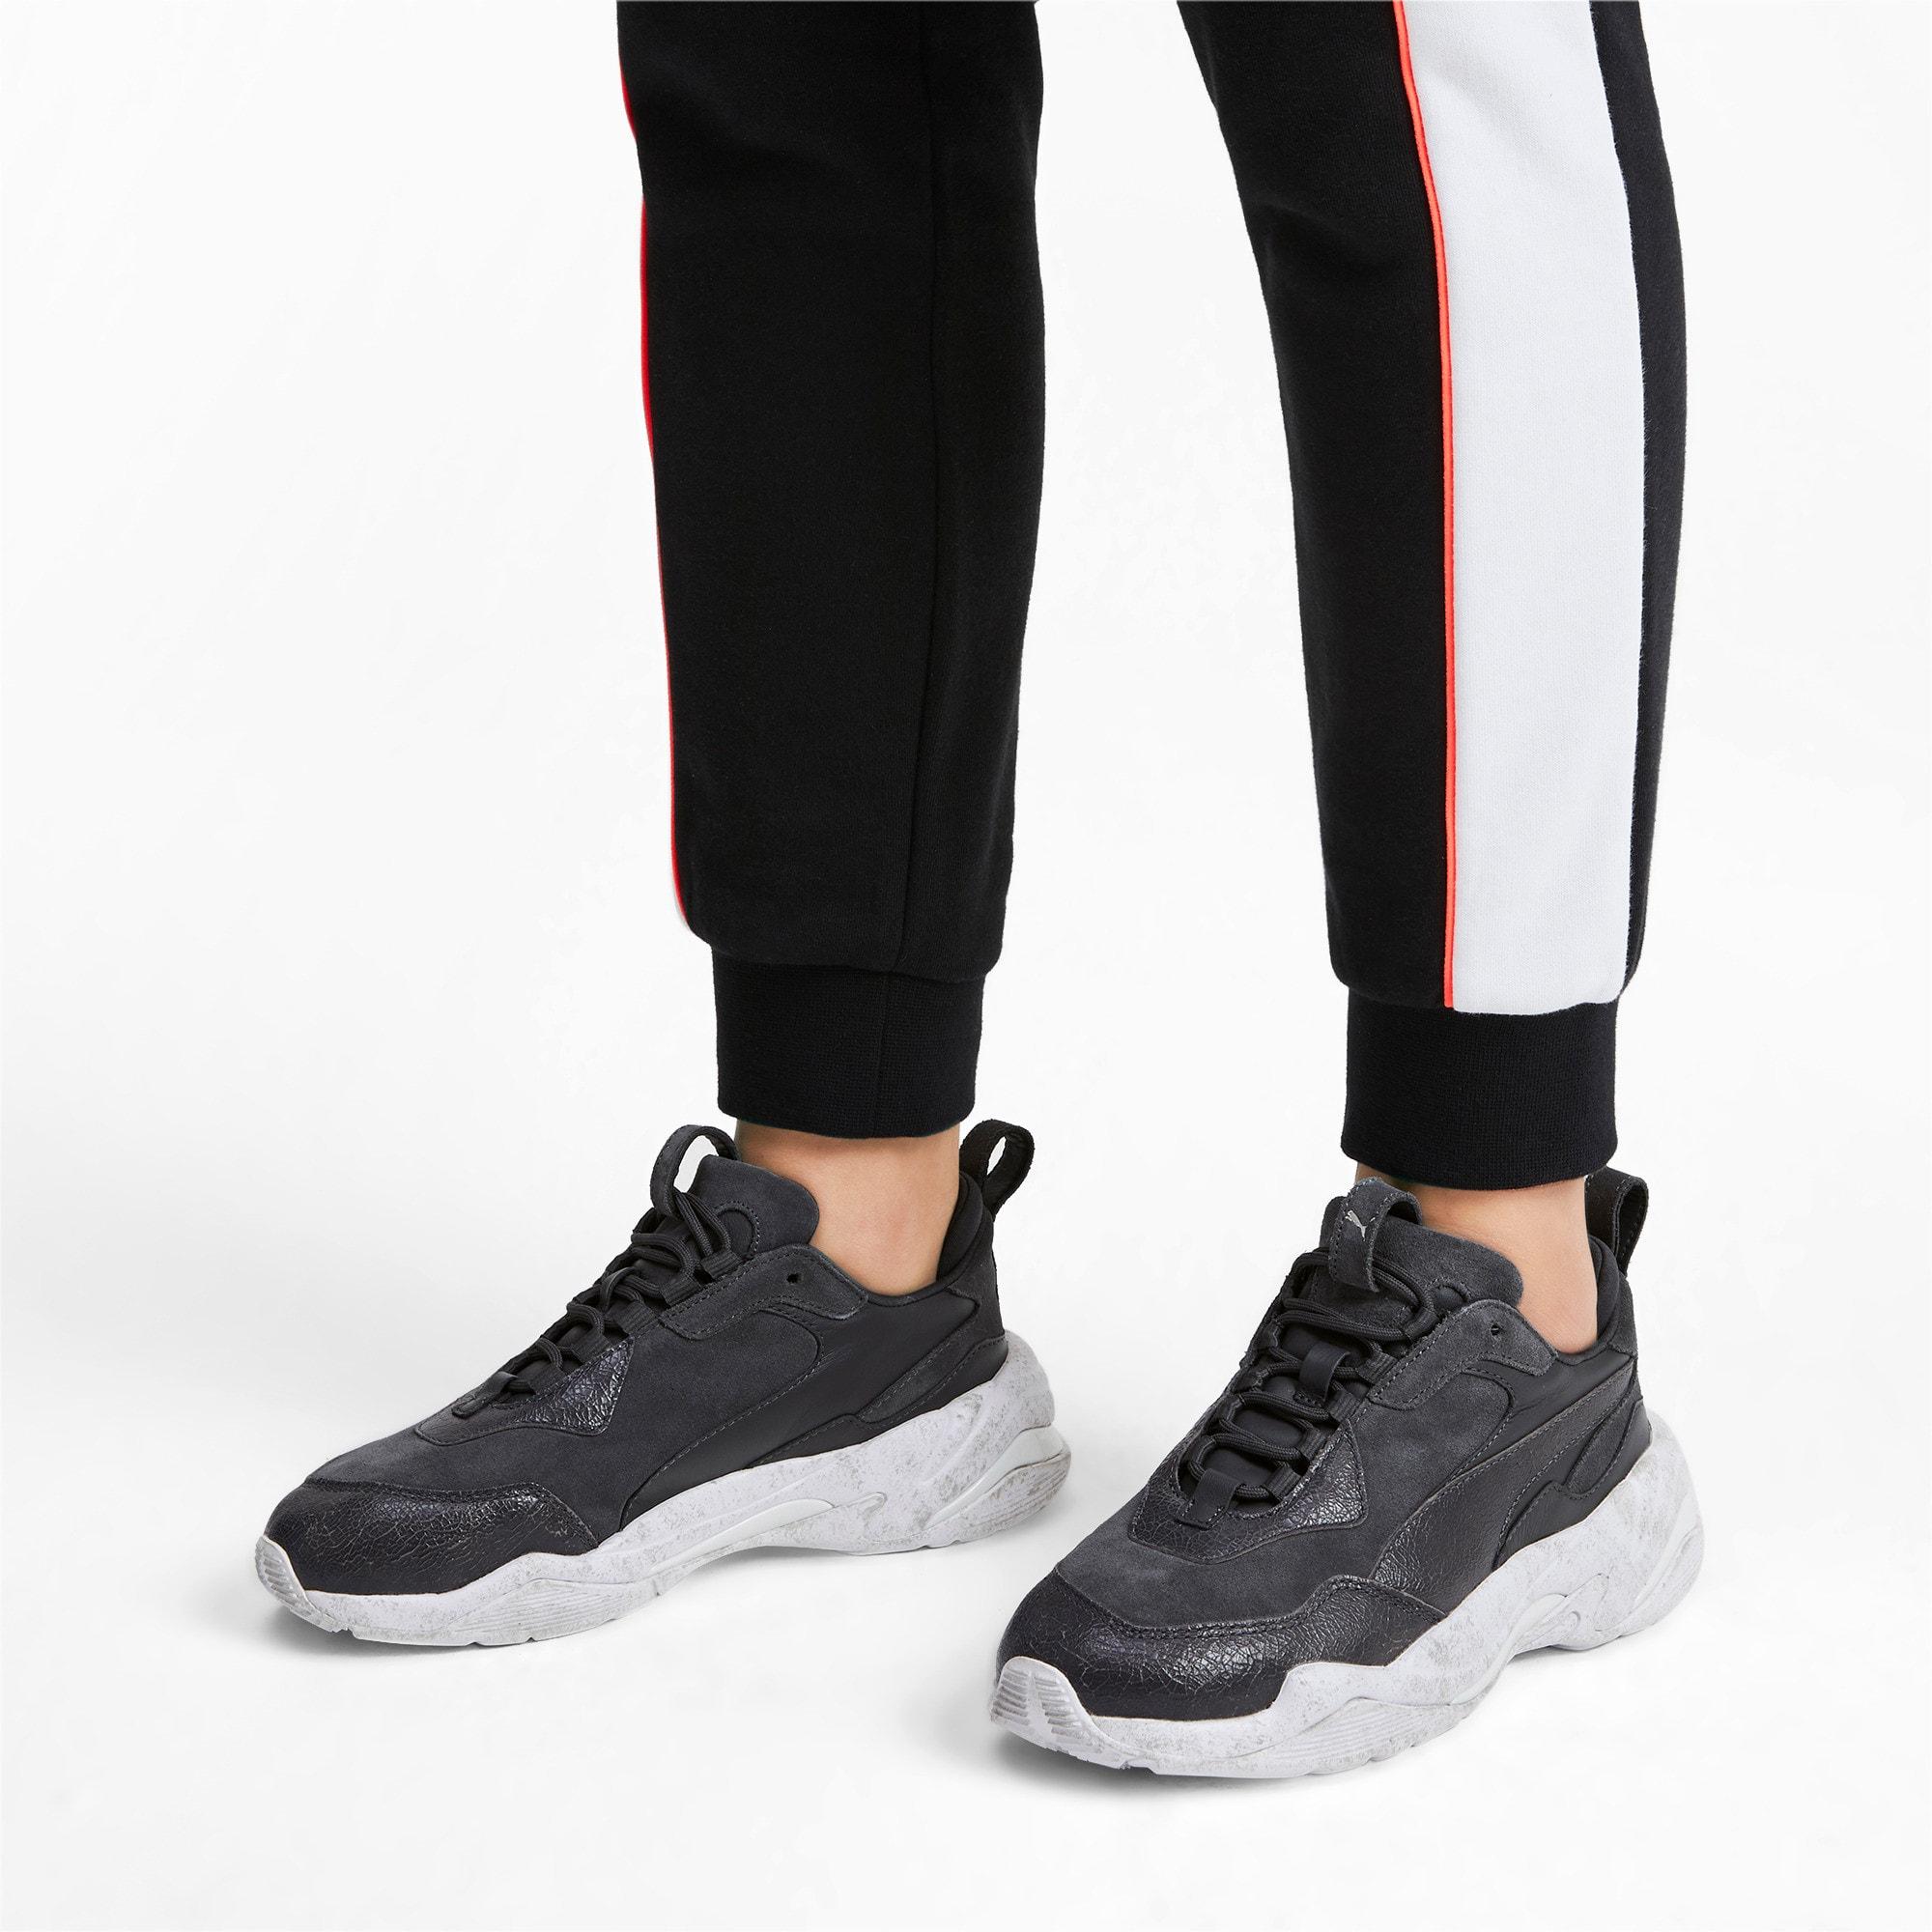 Miniatura 2 de Zapatos deportivos Thunder Distressed para mujer, Ebony-Puma Silver, mediano